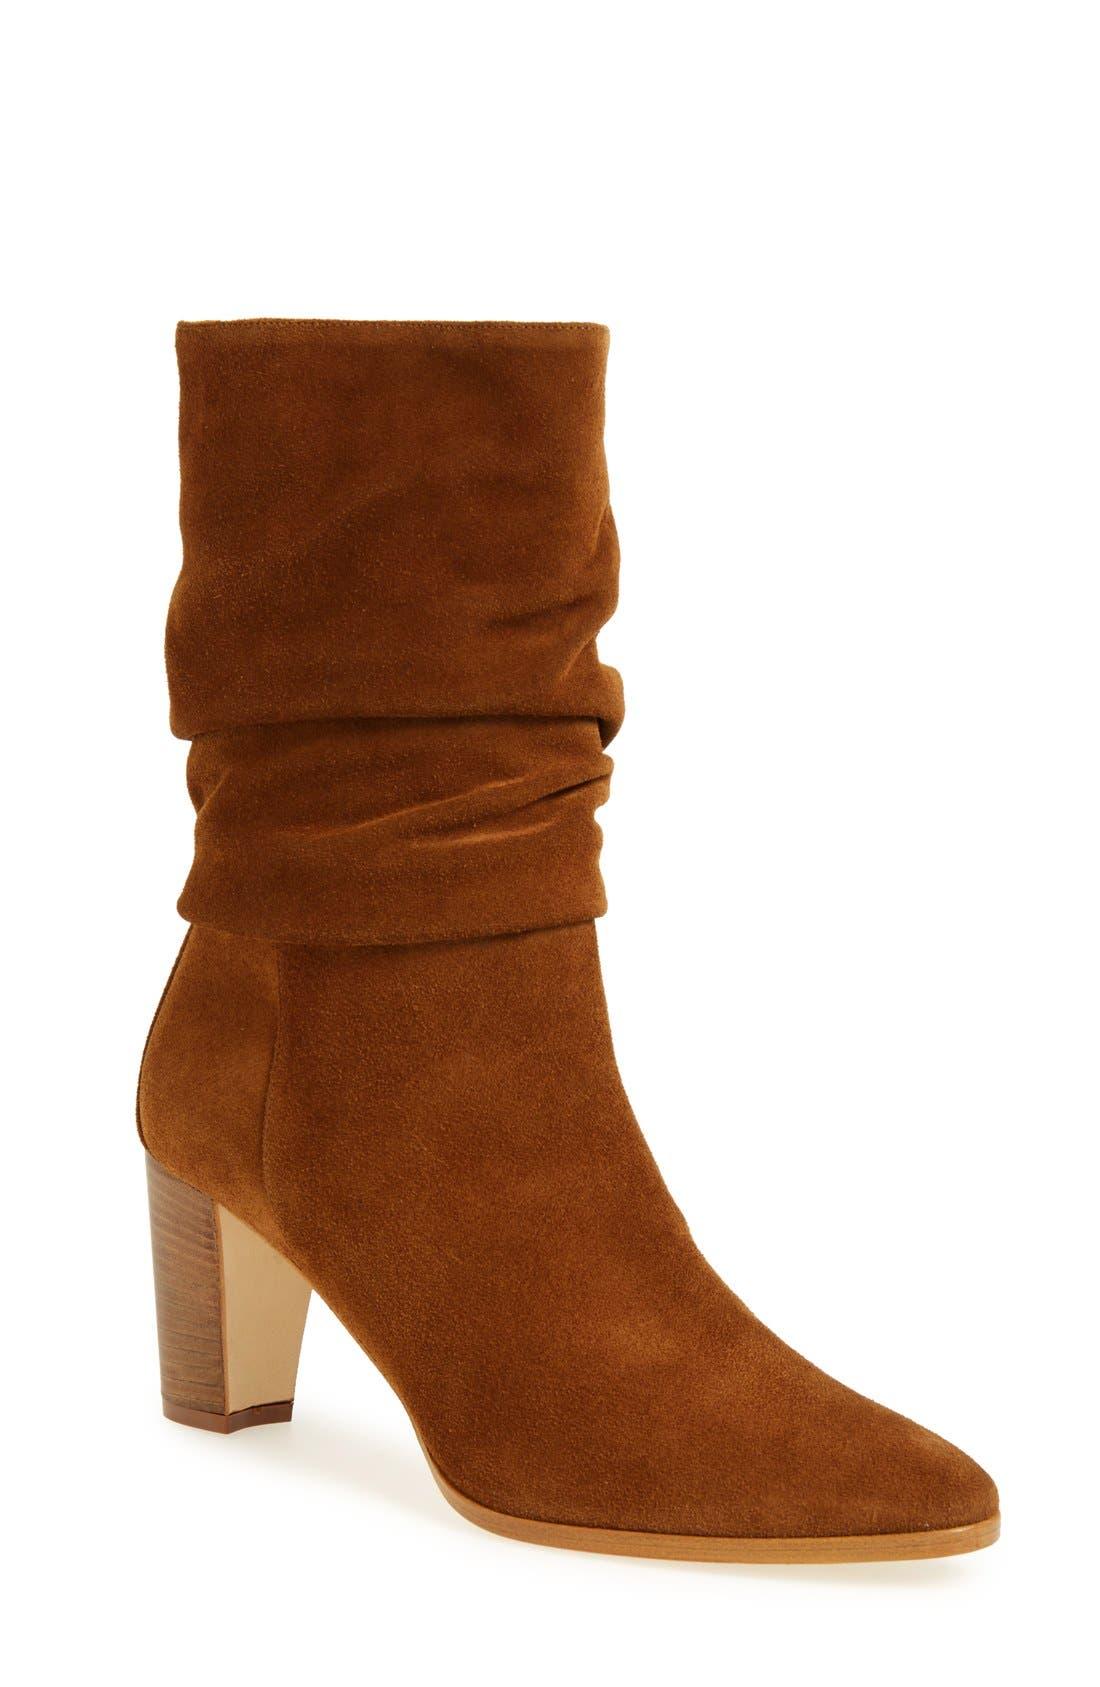 Main Image - Manolo Blahnik Slouch Boot (Women)